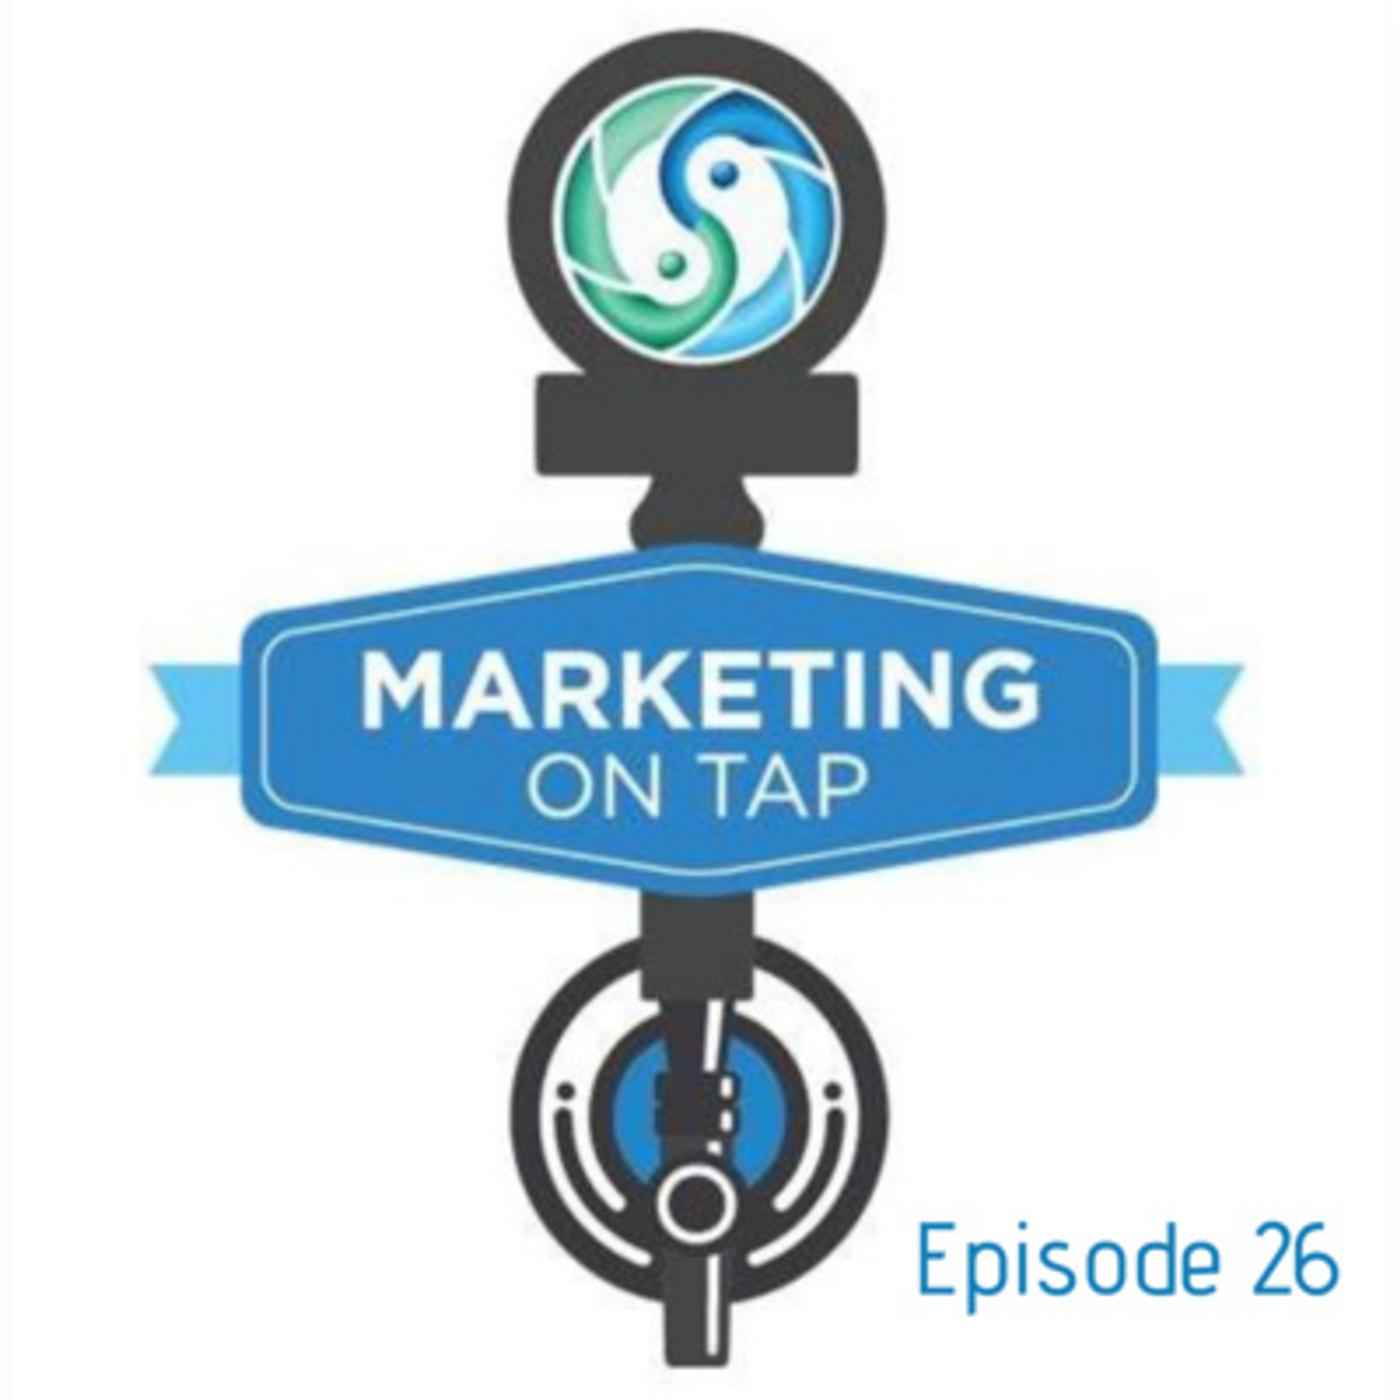 Episode 26: Social Media Addiction - Marketing's Downfall?